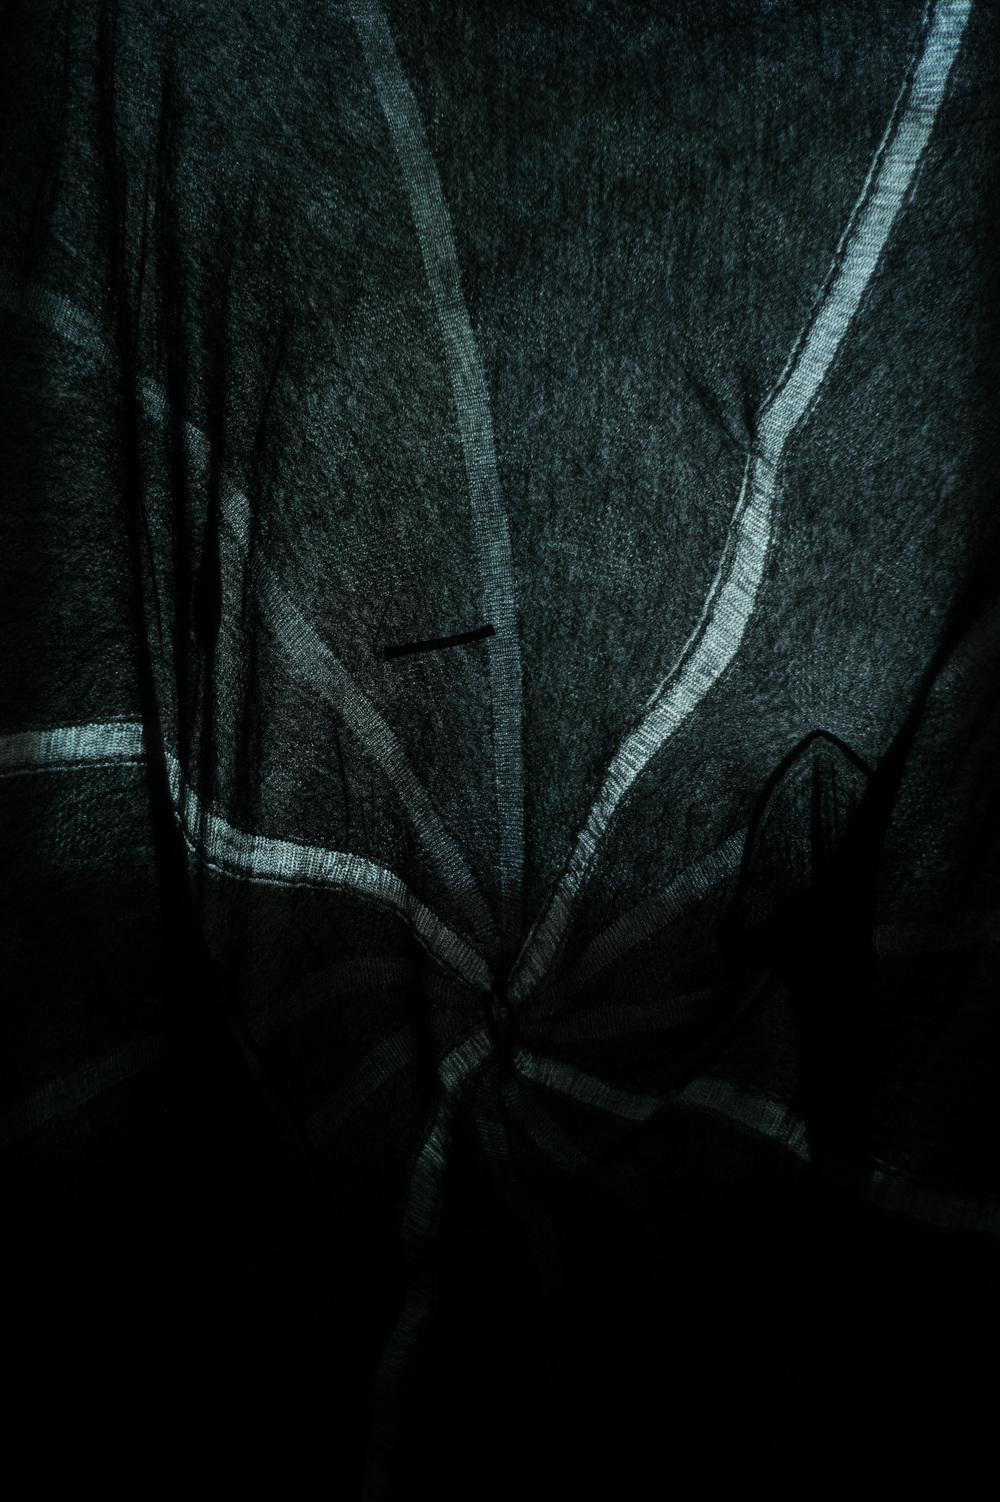 circle fabric | lumen et umbra showroom at S/T by laurent segretier